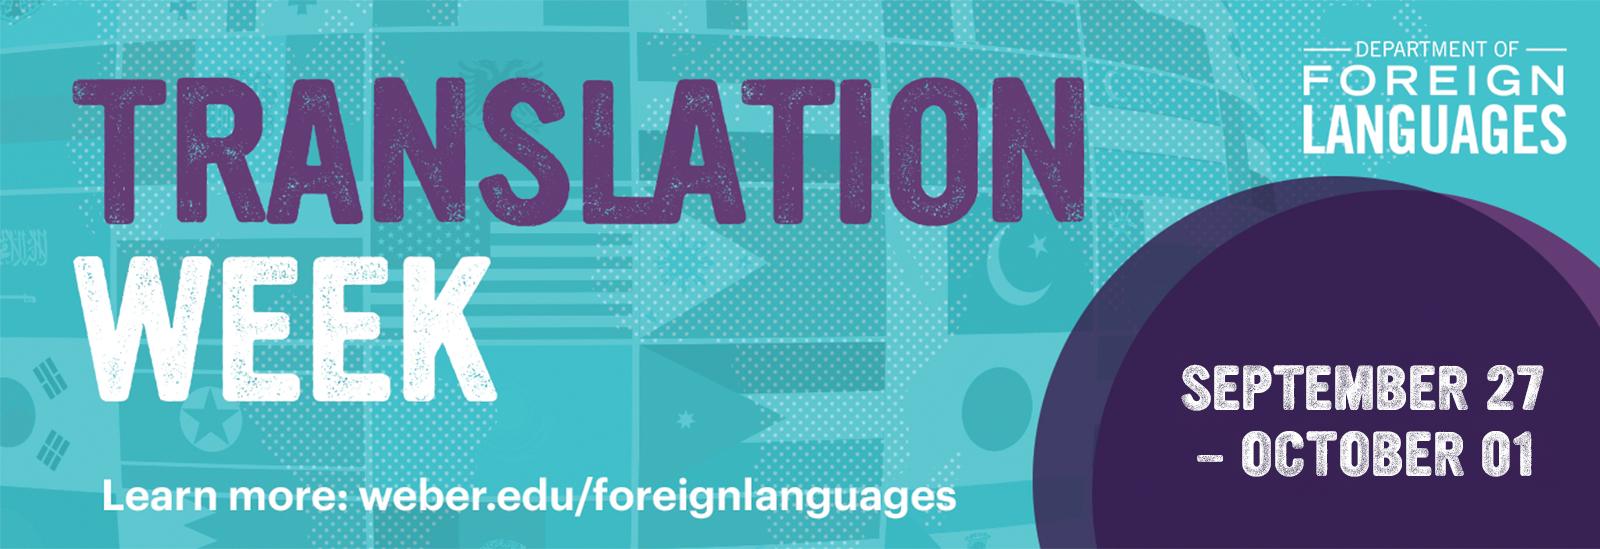 Text reads: Translation Week